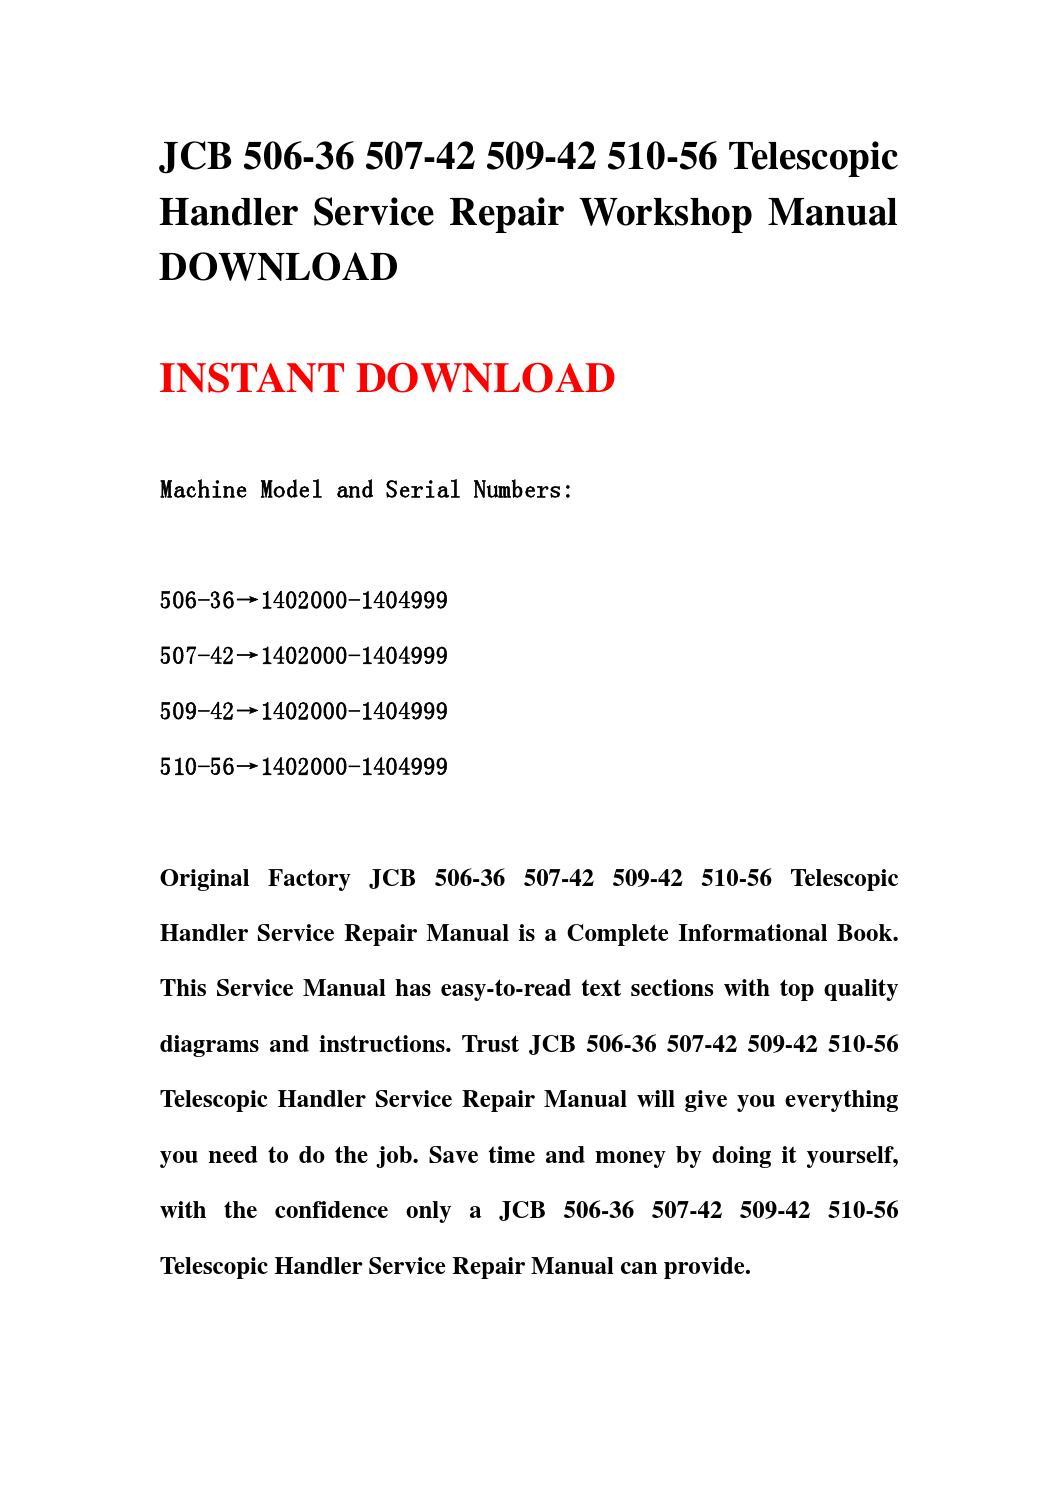 dissertation proposal business studies